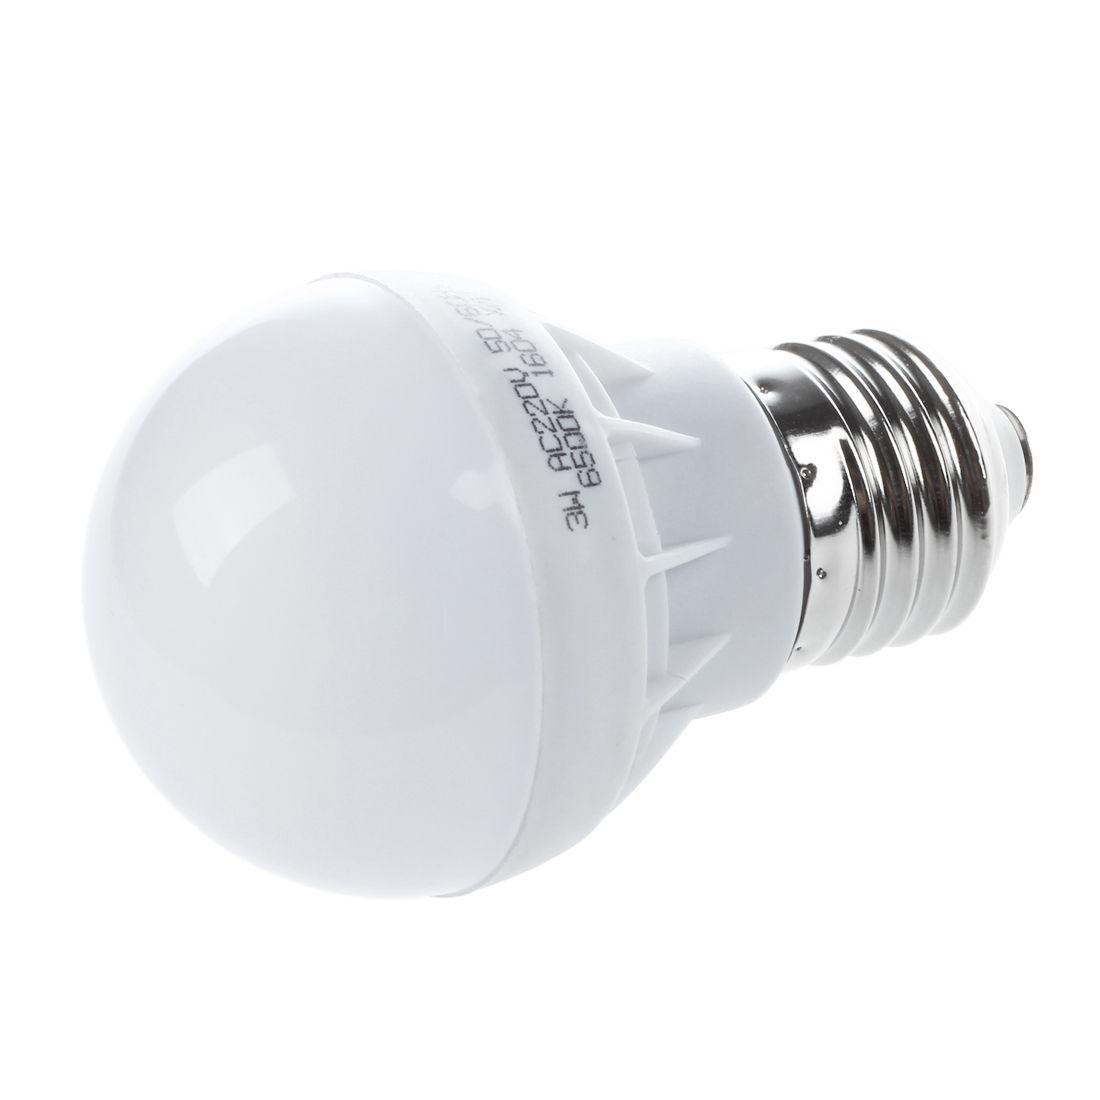 E27 Energiesparende LED-Birne Licht Lampe 220V 3W Cool Weiss JKSY ...